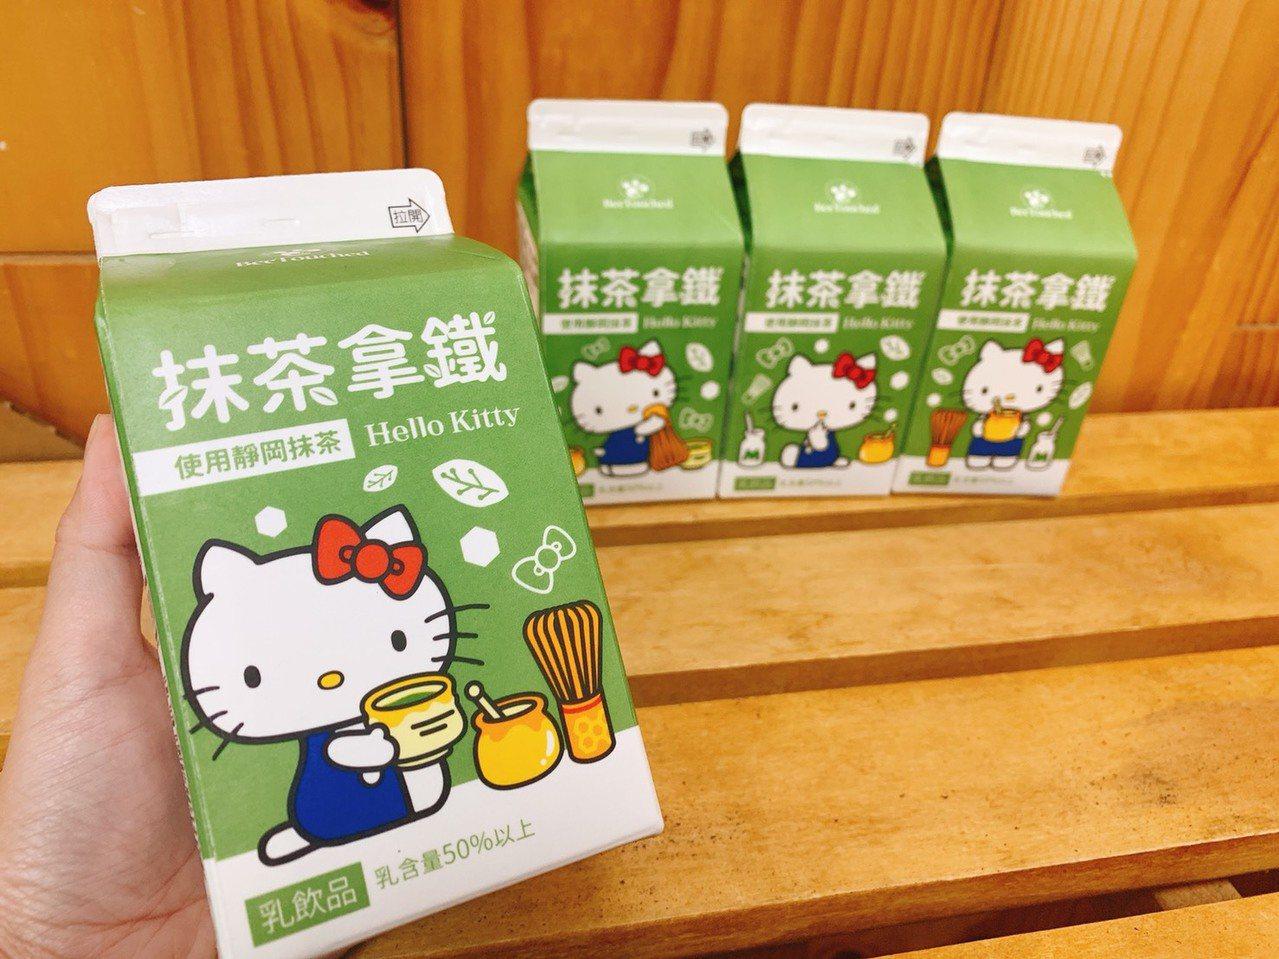 7-ELEVEN推出Hello Kitty包裝的蜜蜂工坊抹茶拿鐵,售價35元,1...